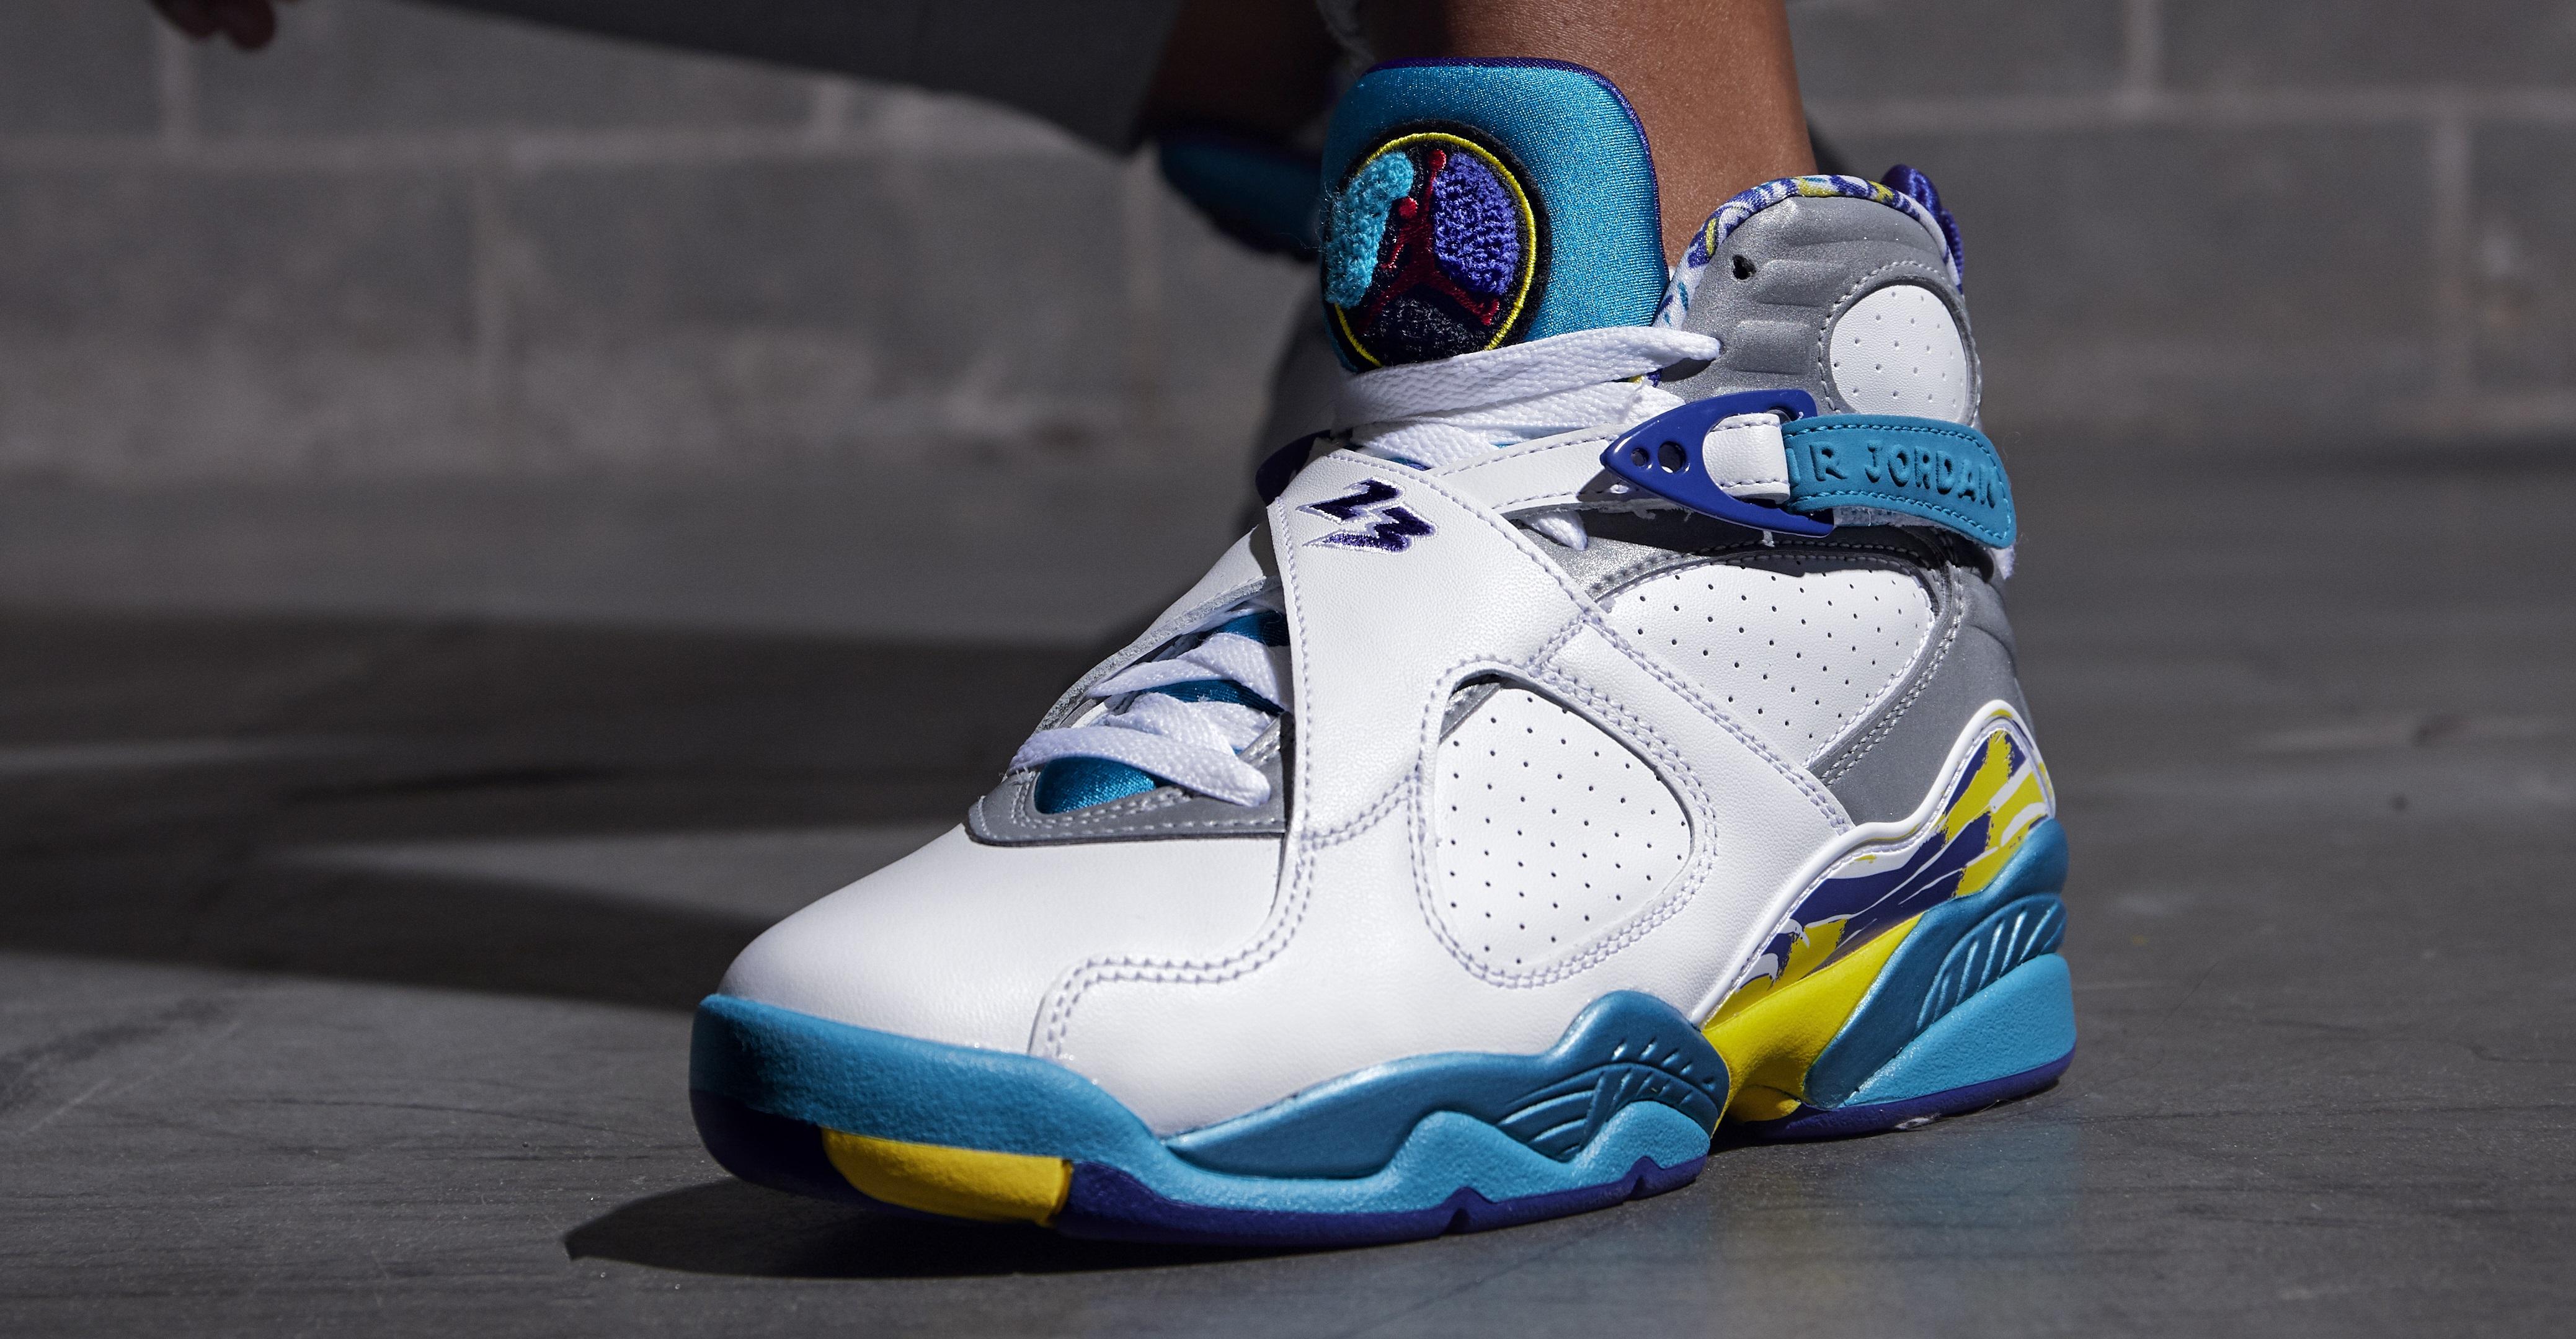 Nike Jordan Air